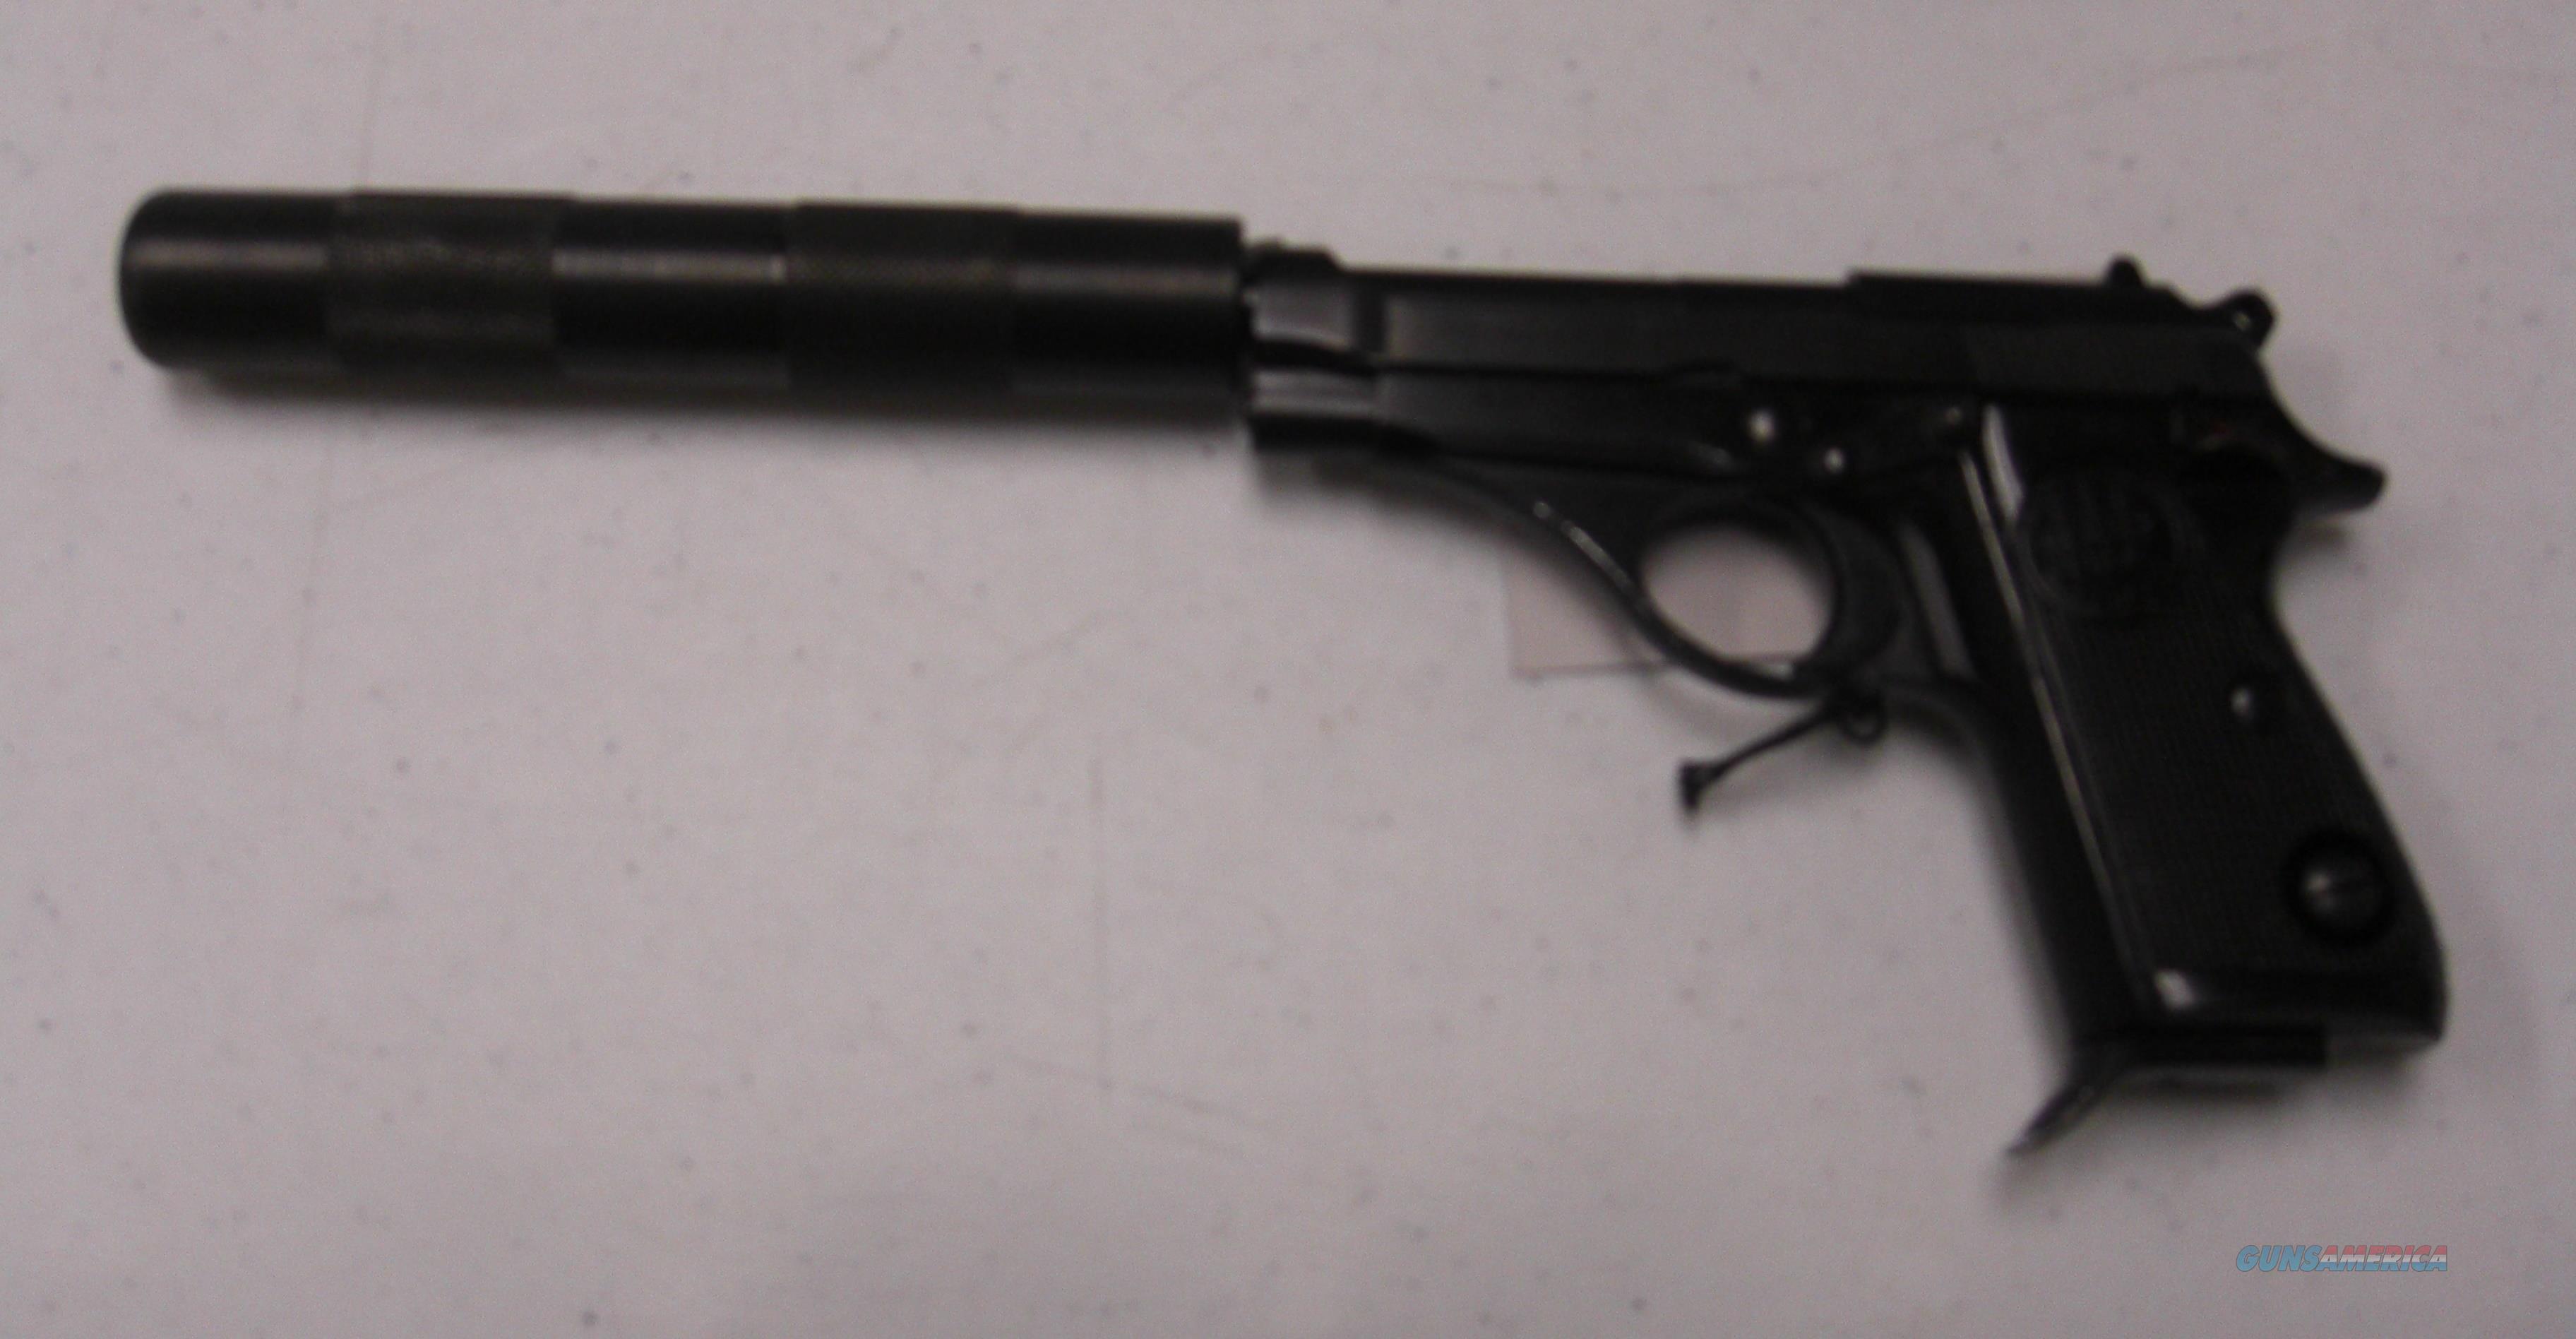 Beretta 71 Jaguar w/ fake suppressor  Guns > Pistols > Beretta Pistols > Rare & Collectible